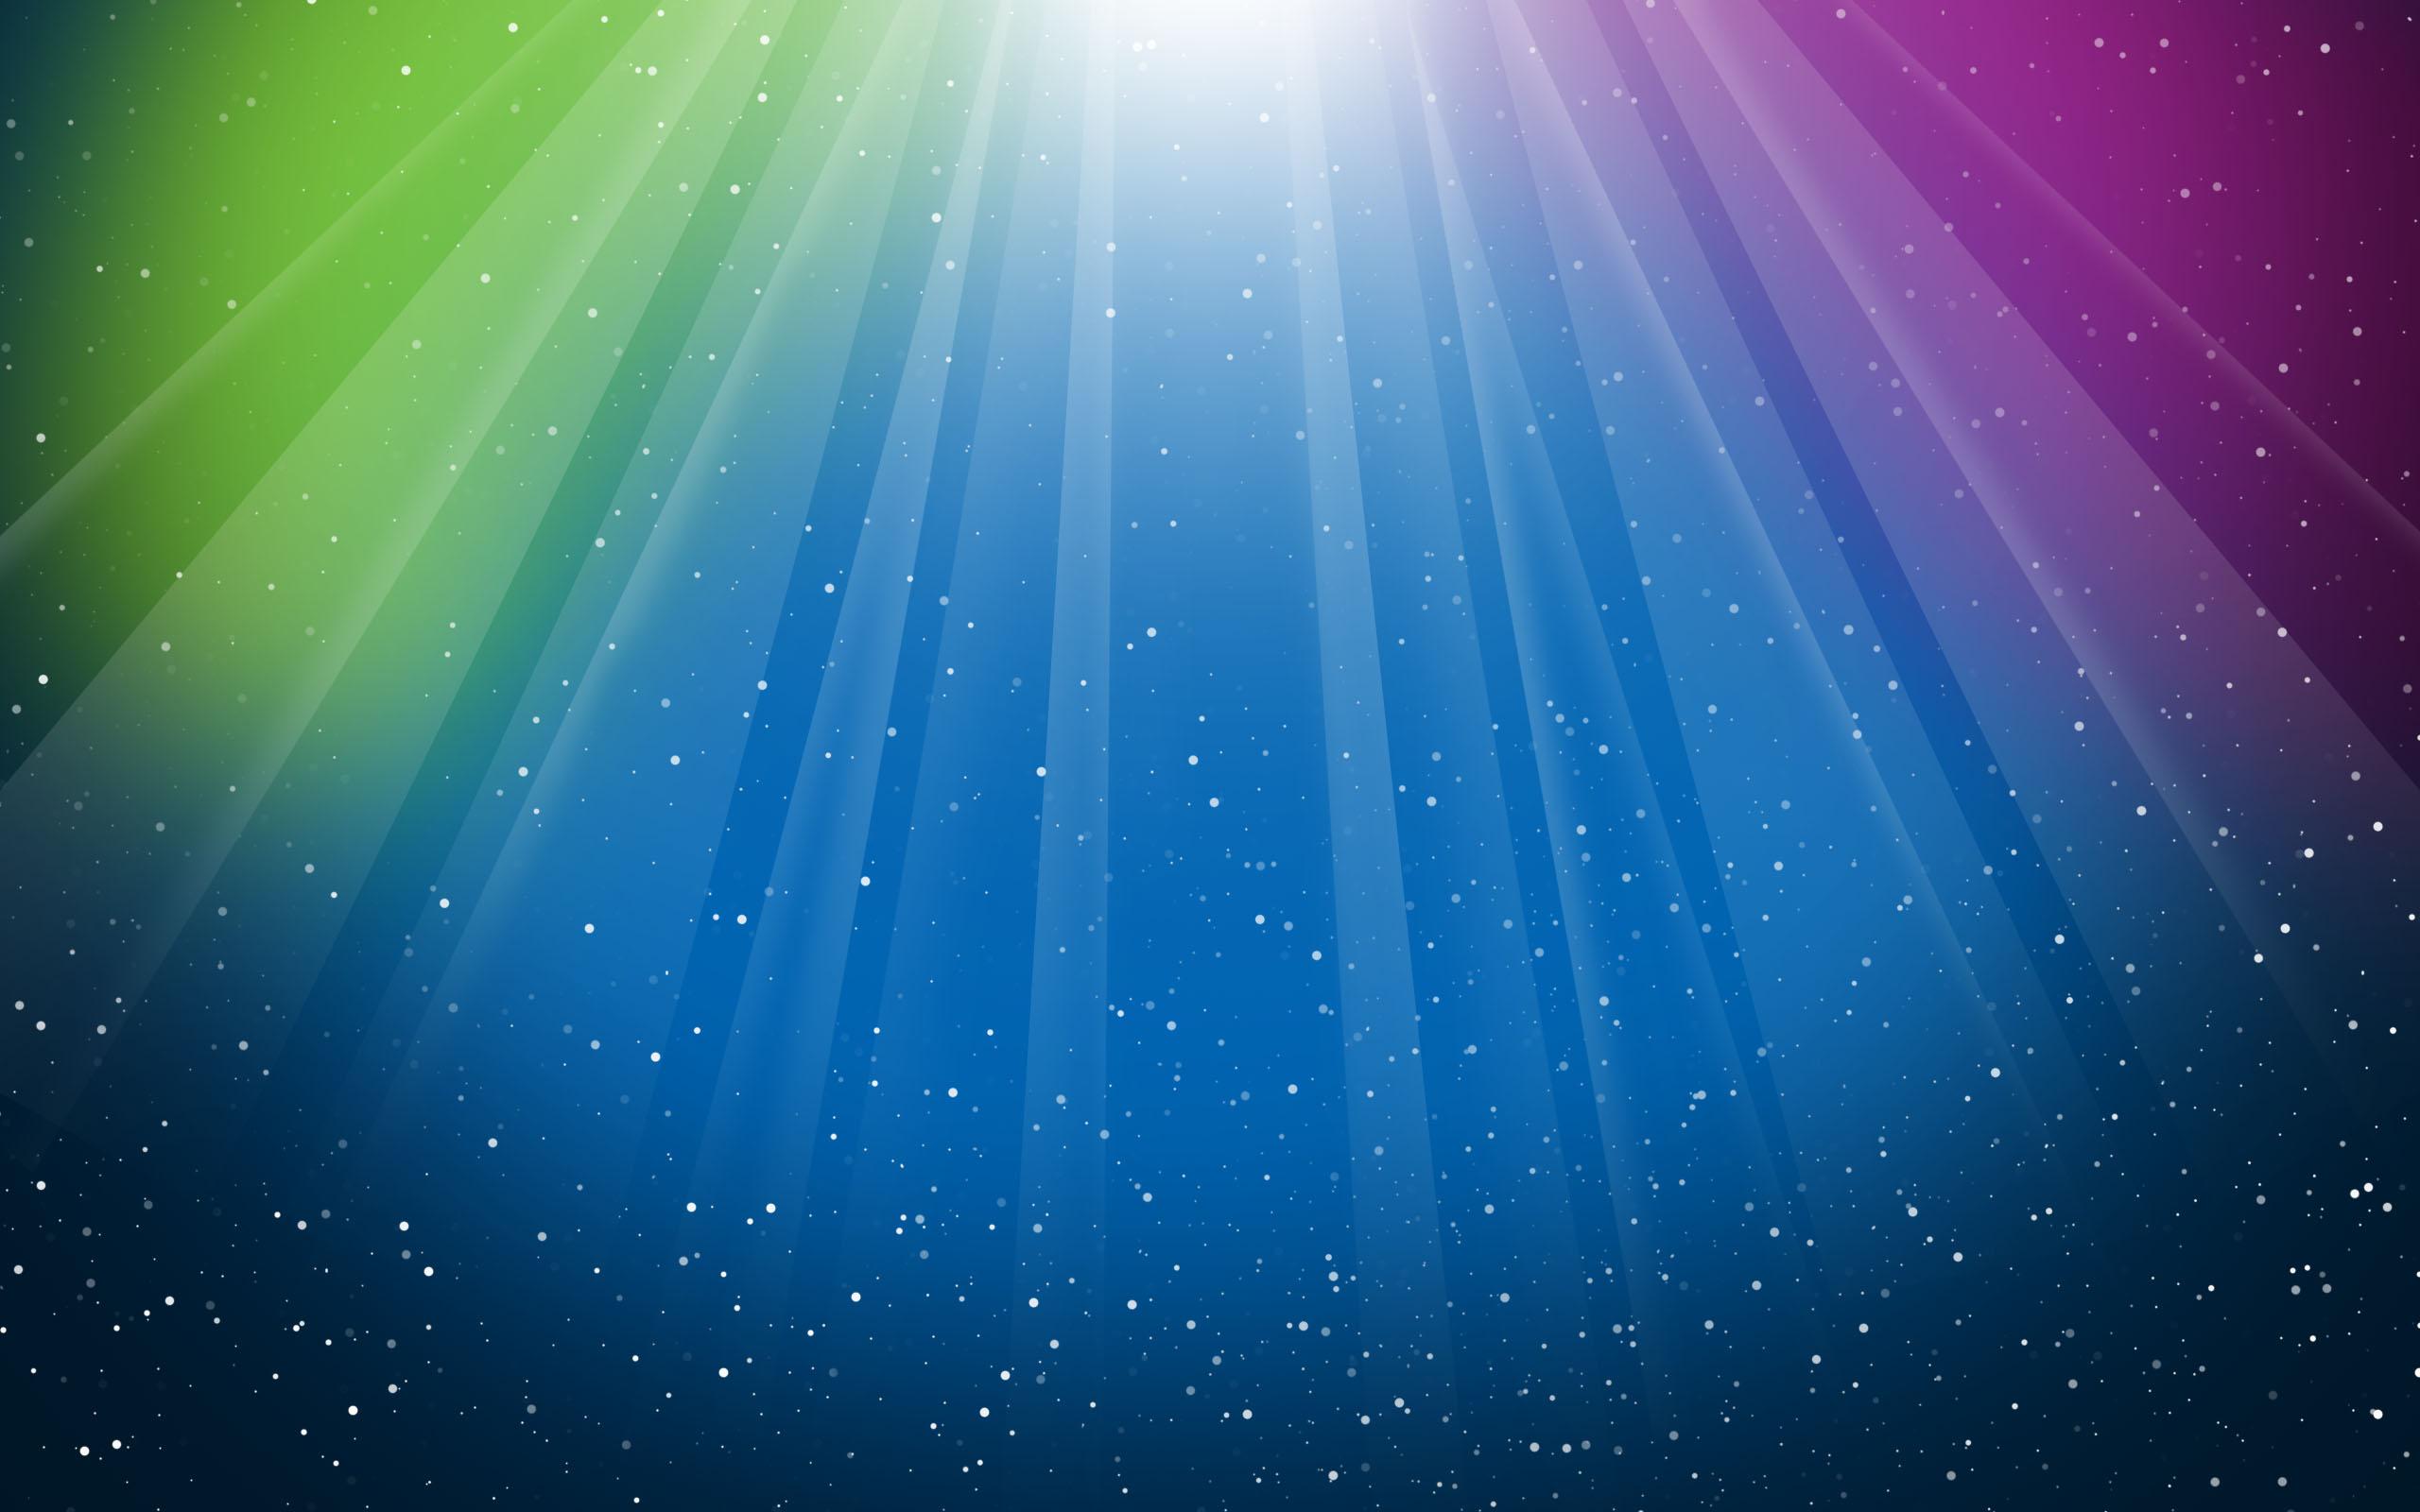 Colores degradados - 2560x1600